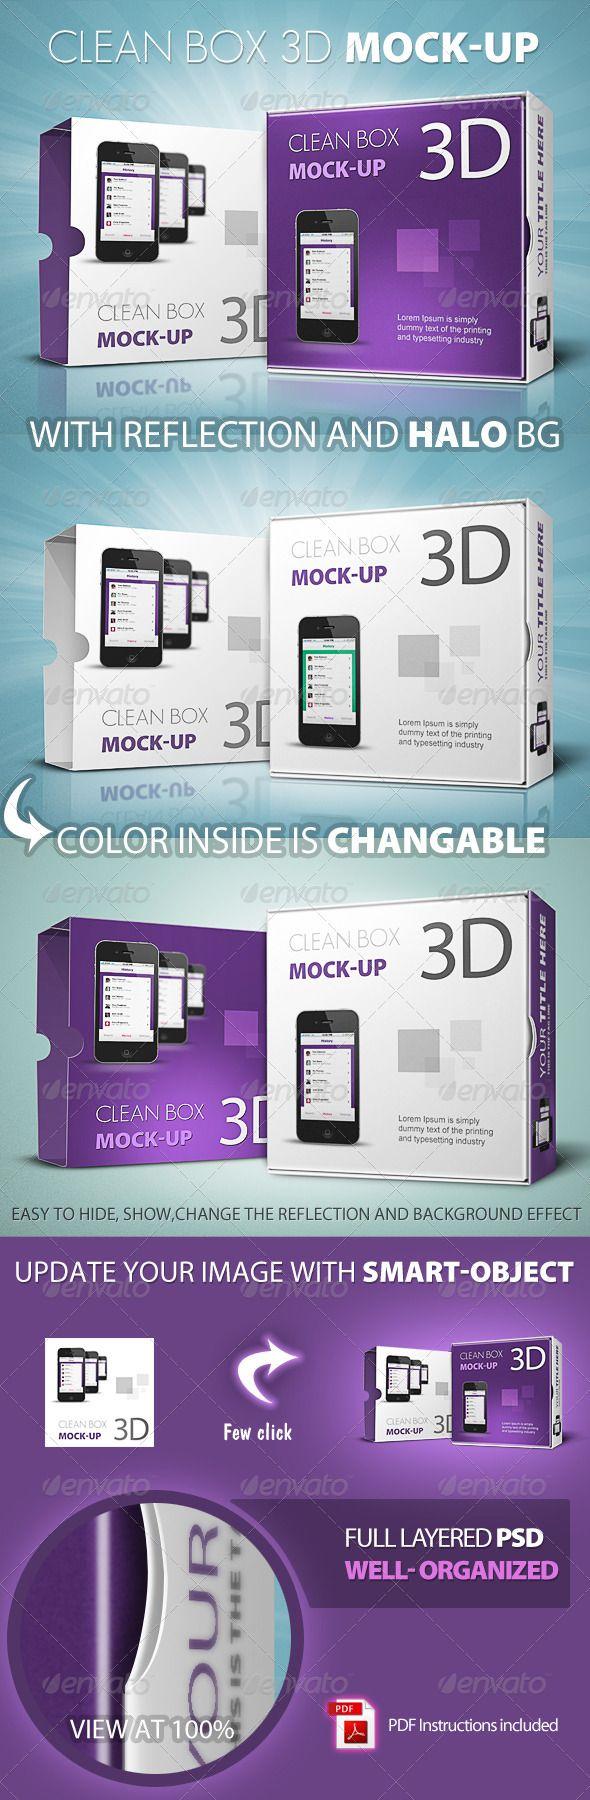 Clean Box 3D Mock-up